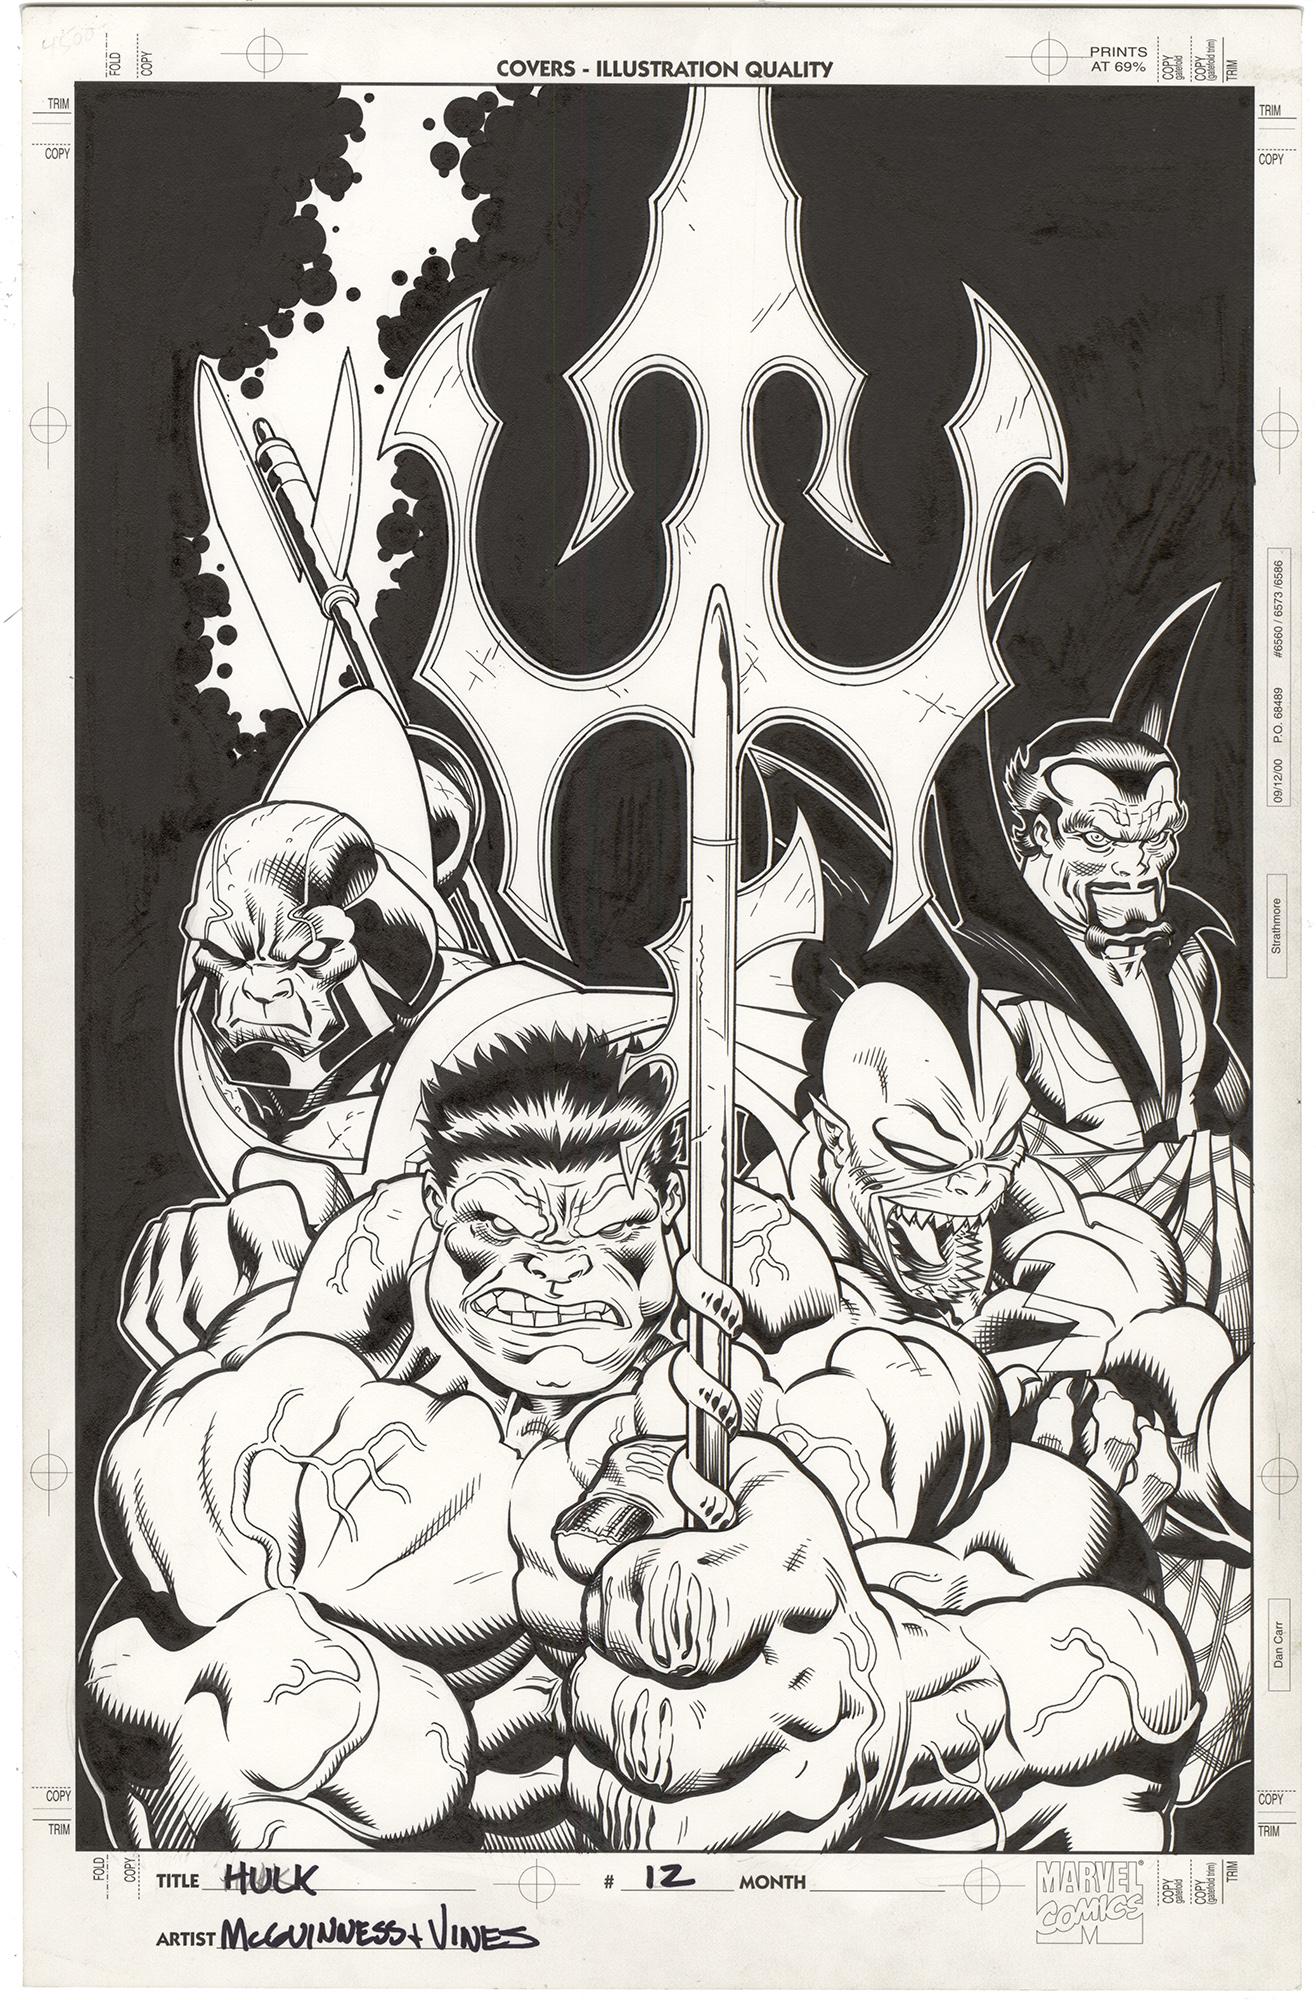 Hulk #12 Cover